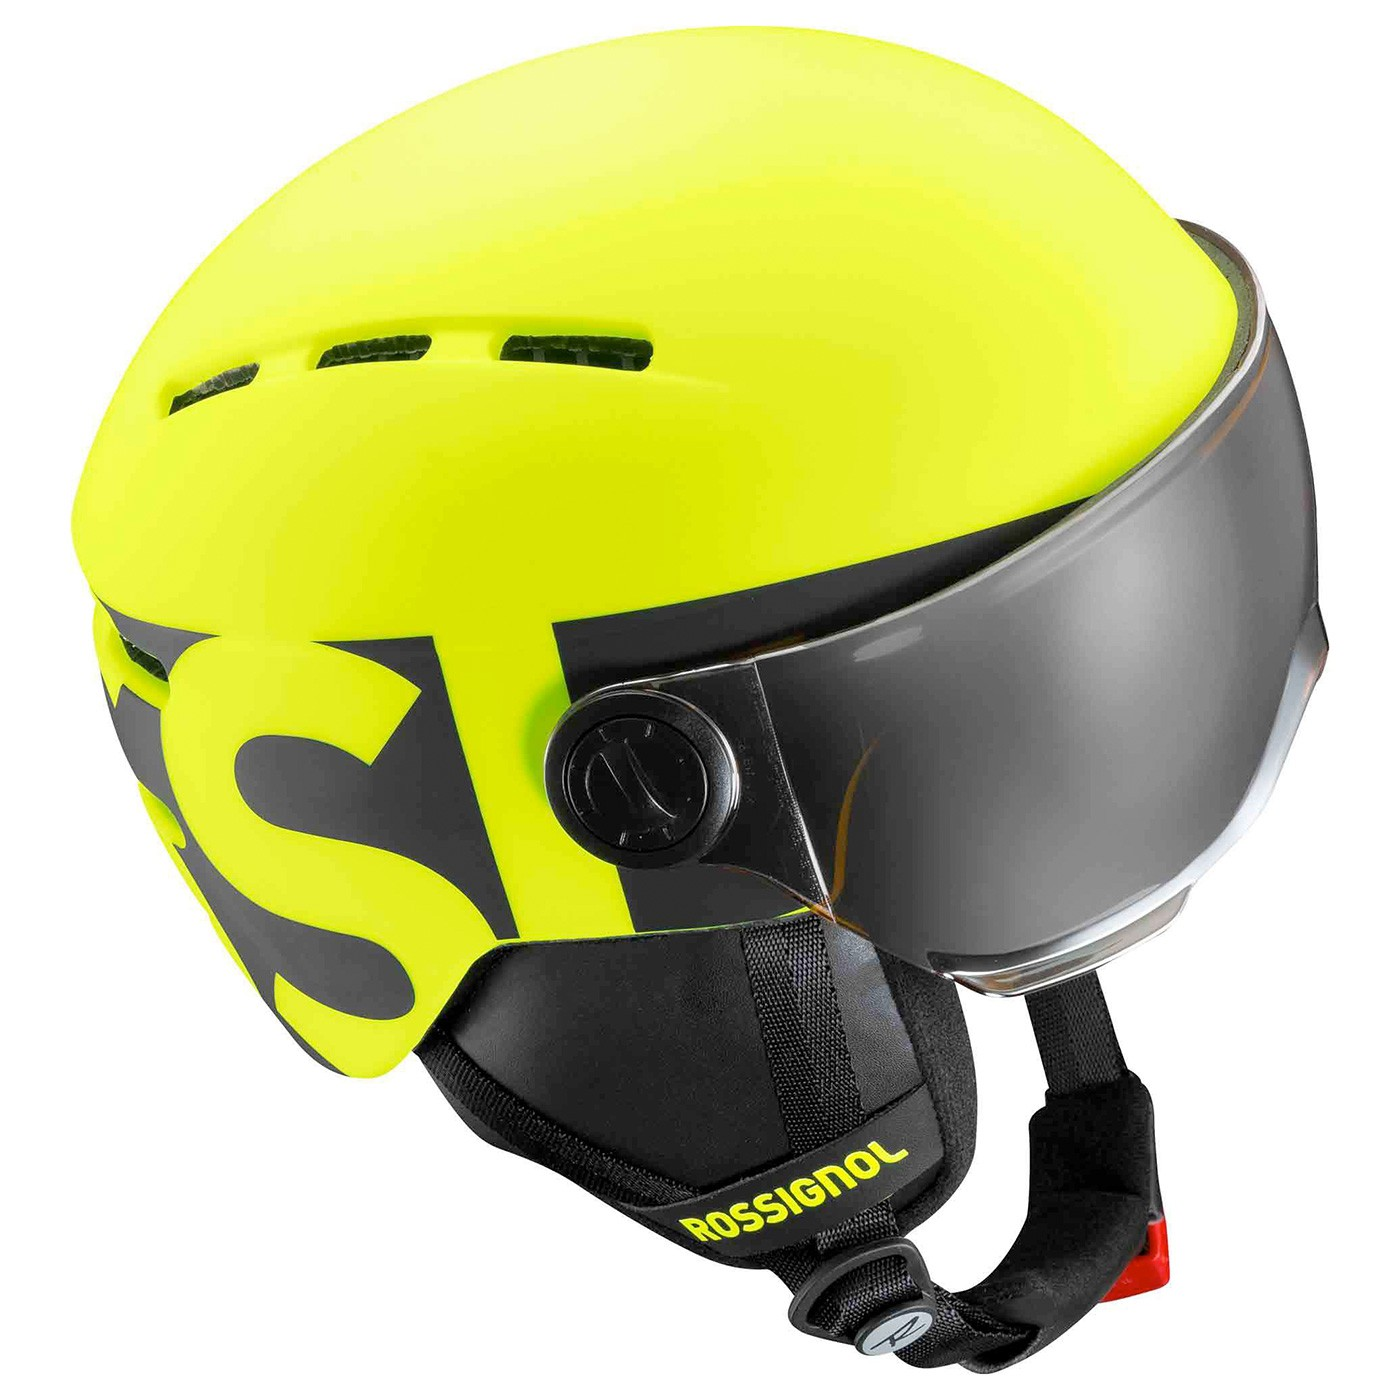 casco sci donna  Casco sci Rossignol Visor Jr - Caschi sci junior